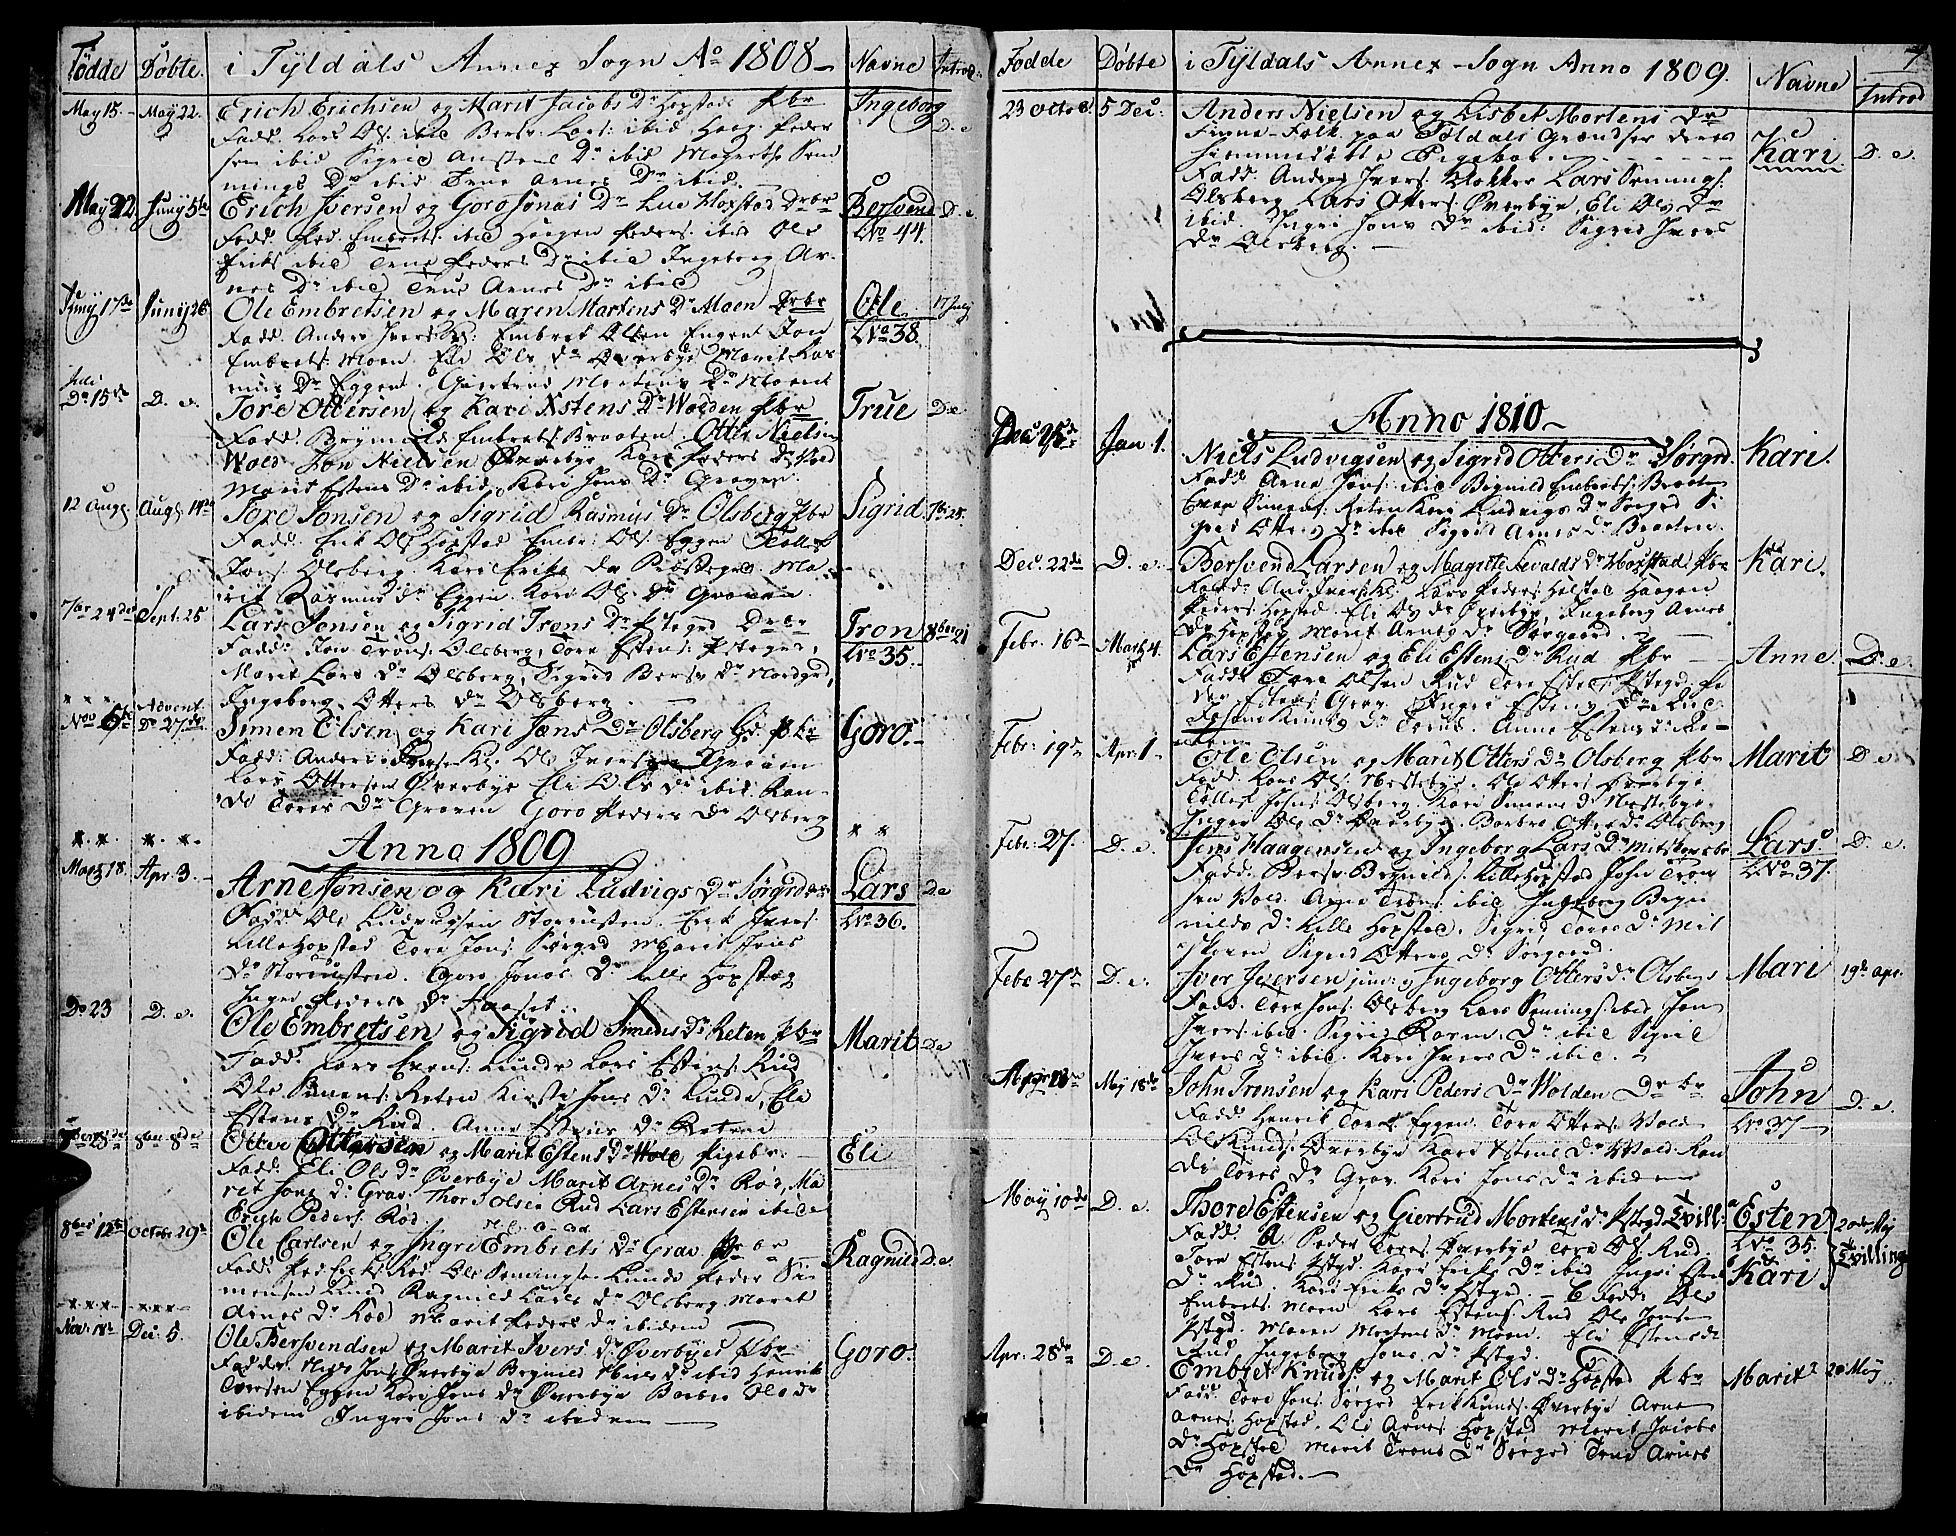 SAH, Tynset prestekontor, Ministerialbok nr. 17, 1801-1814, s. 7